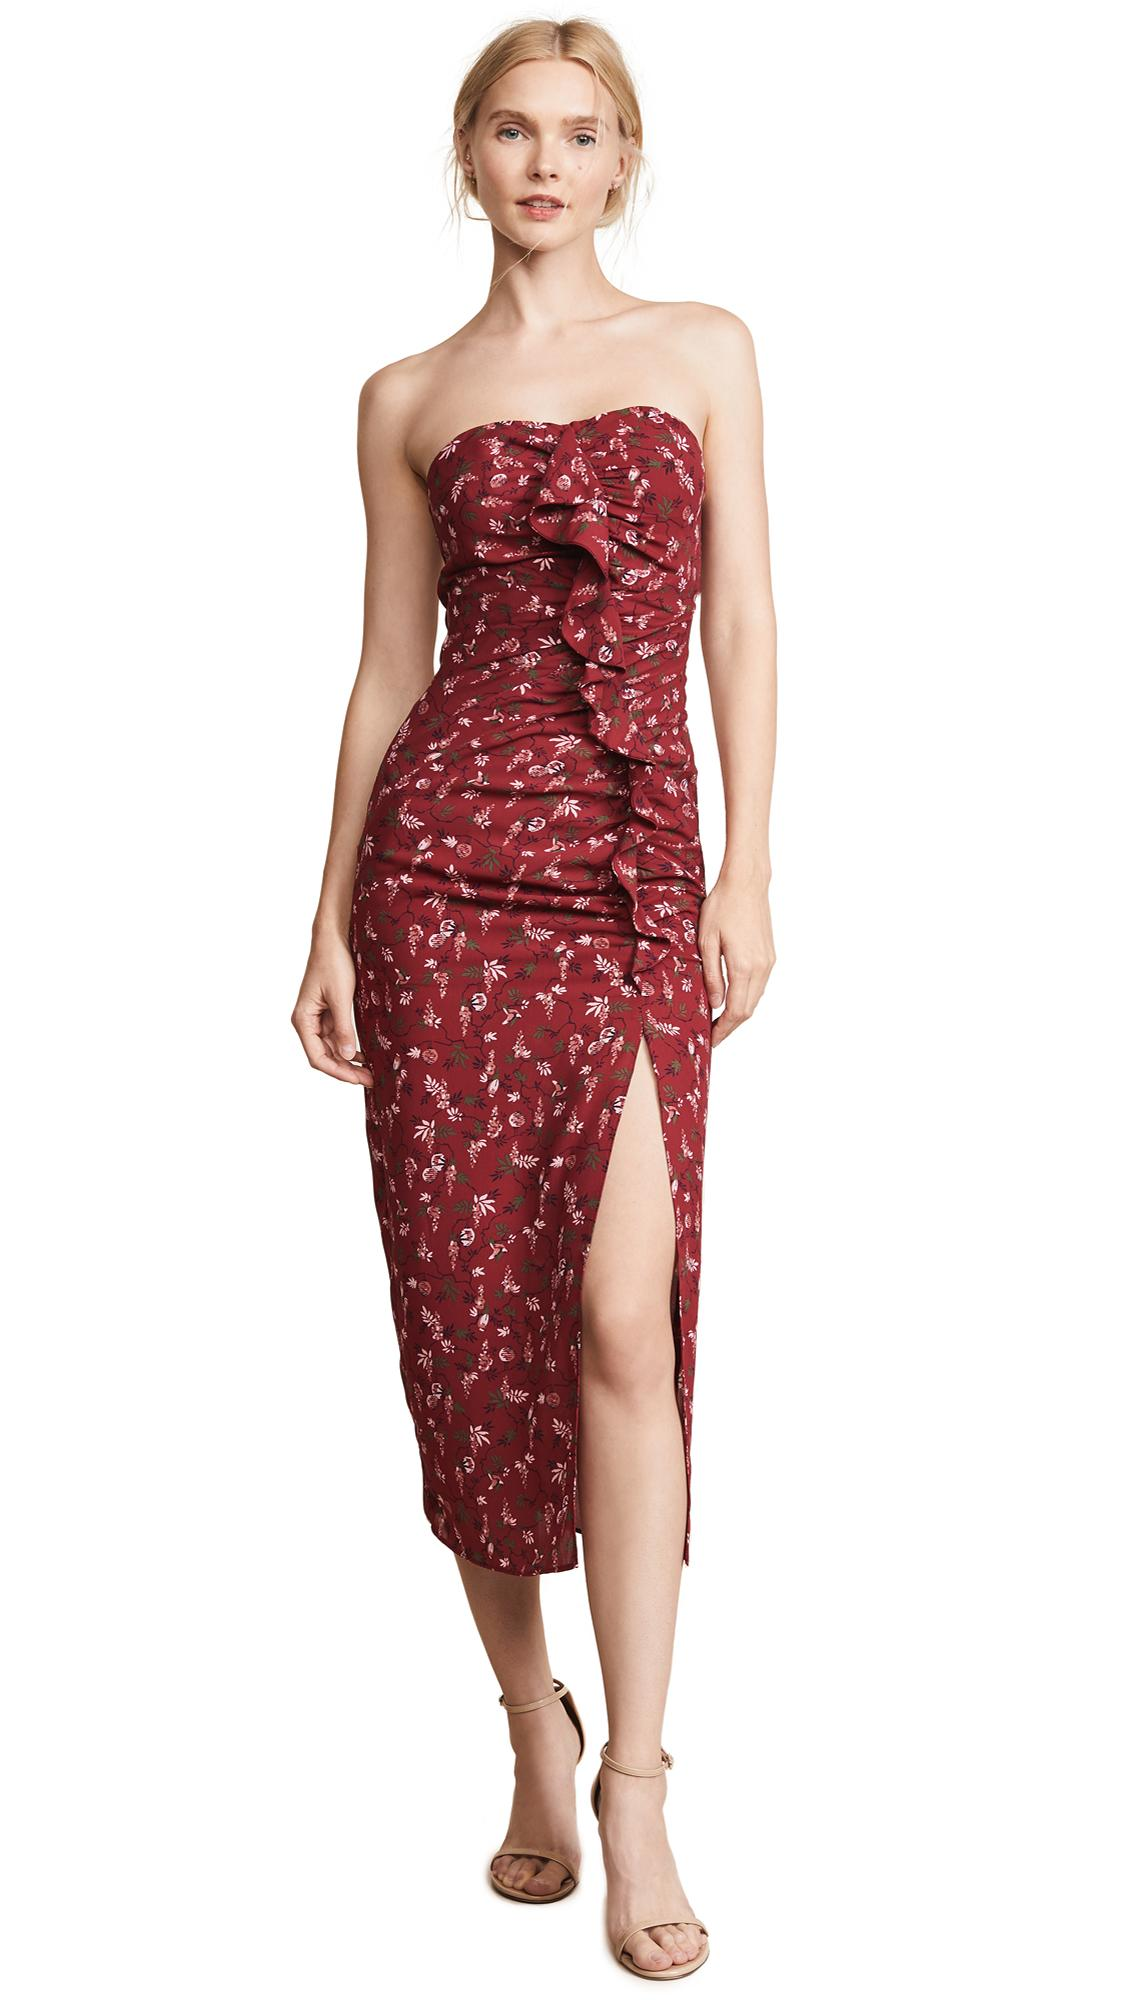 0688392e32c7 Likely Ali Dress In Rumba Red Multi | ModeSens